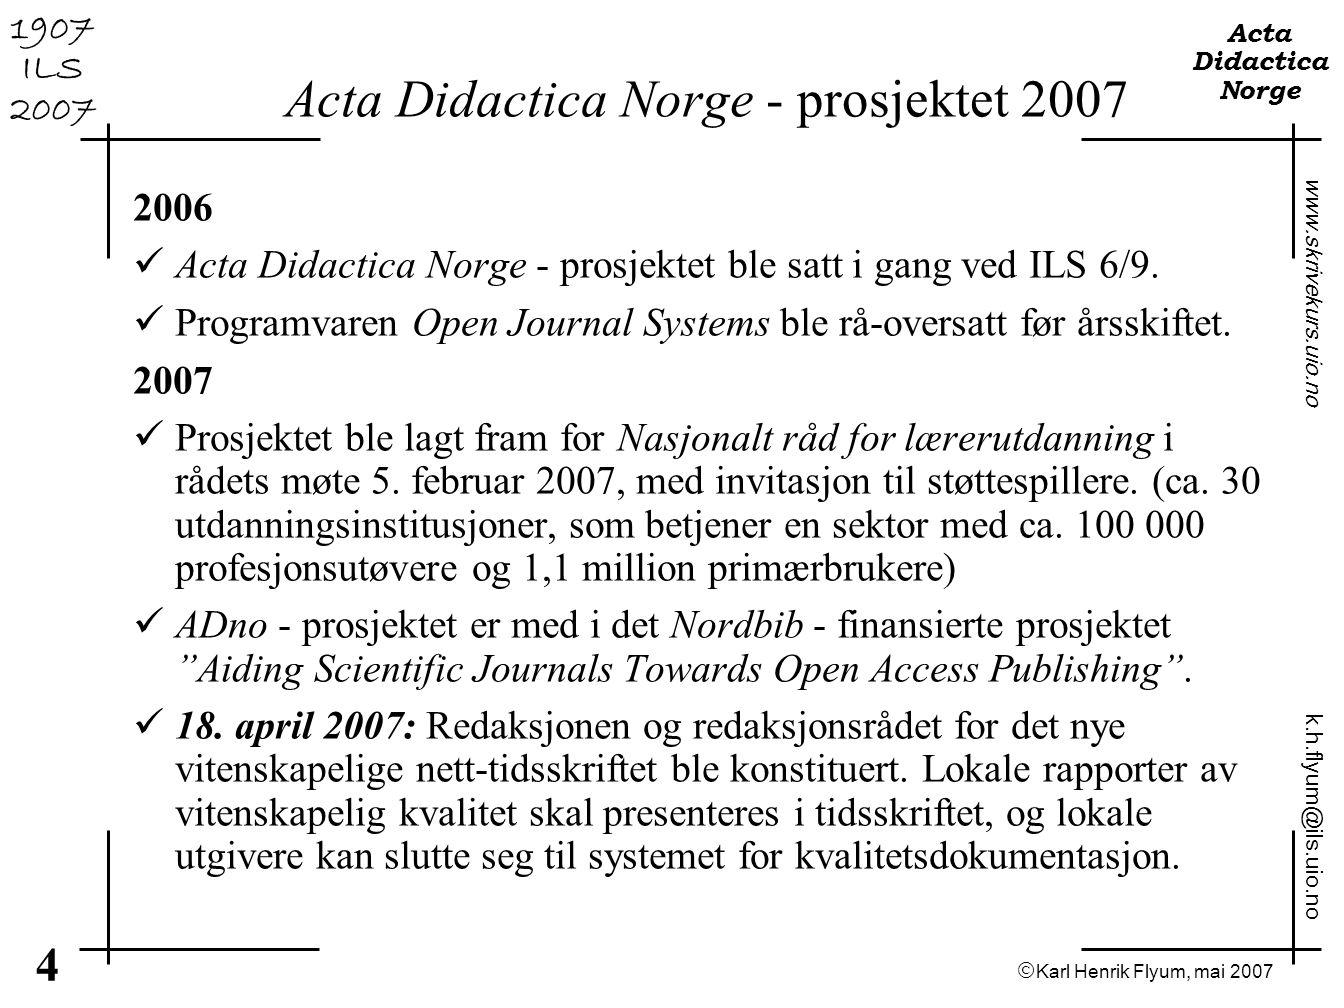 Acta Didactica Norge - prosjektet 2007